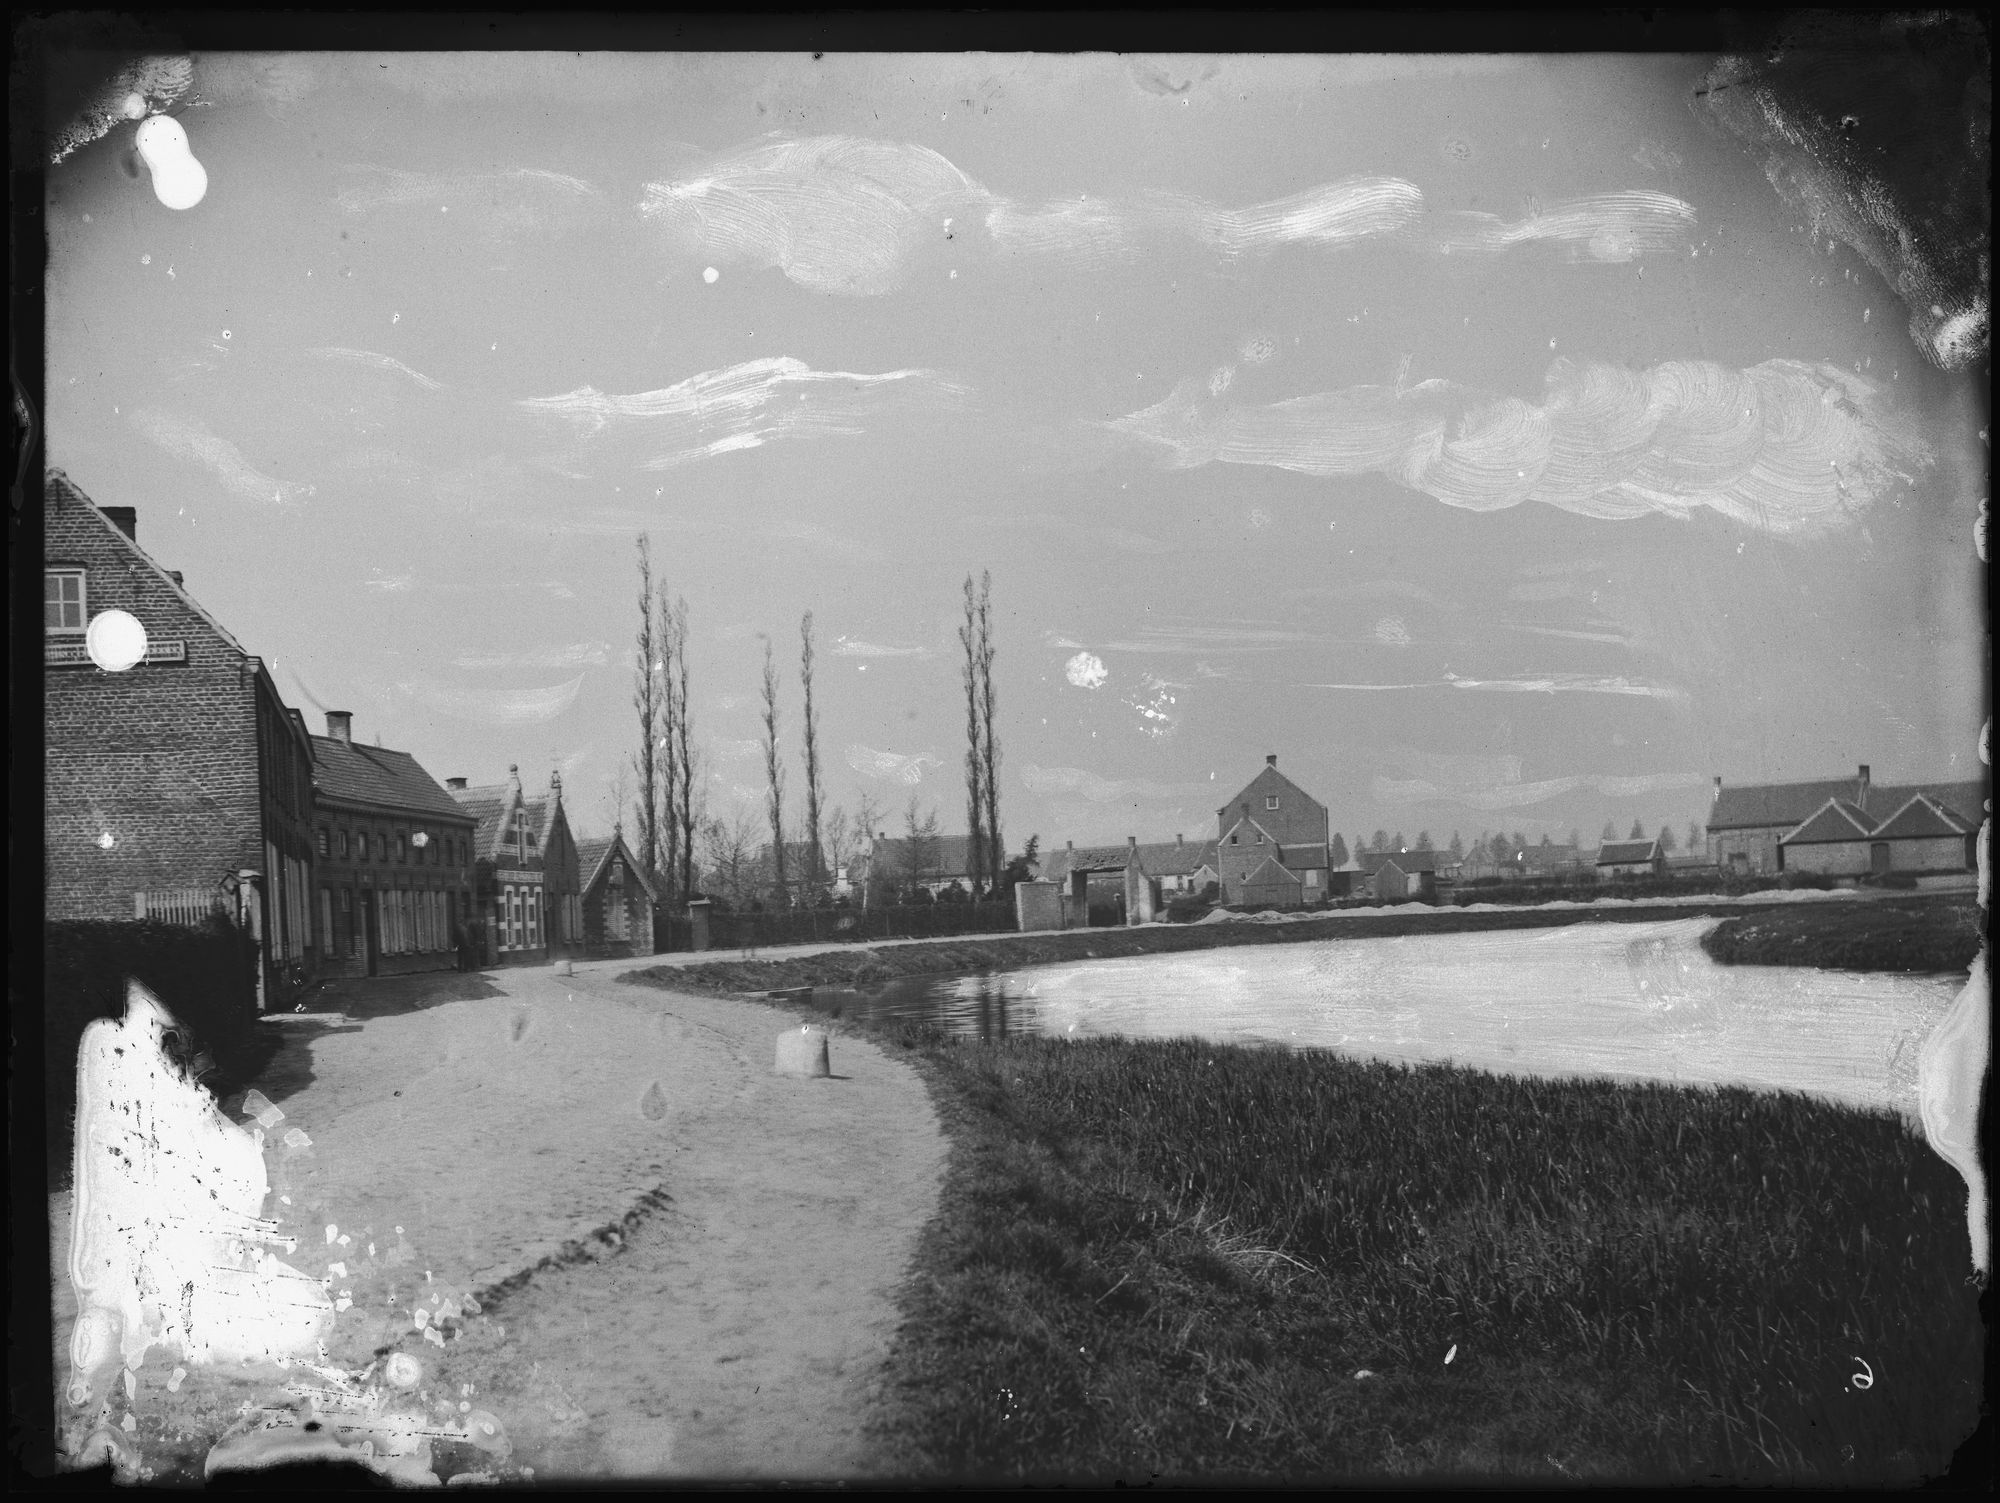 Leiebocht circa 1895